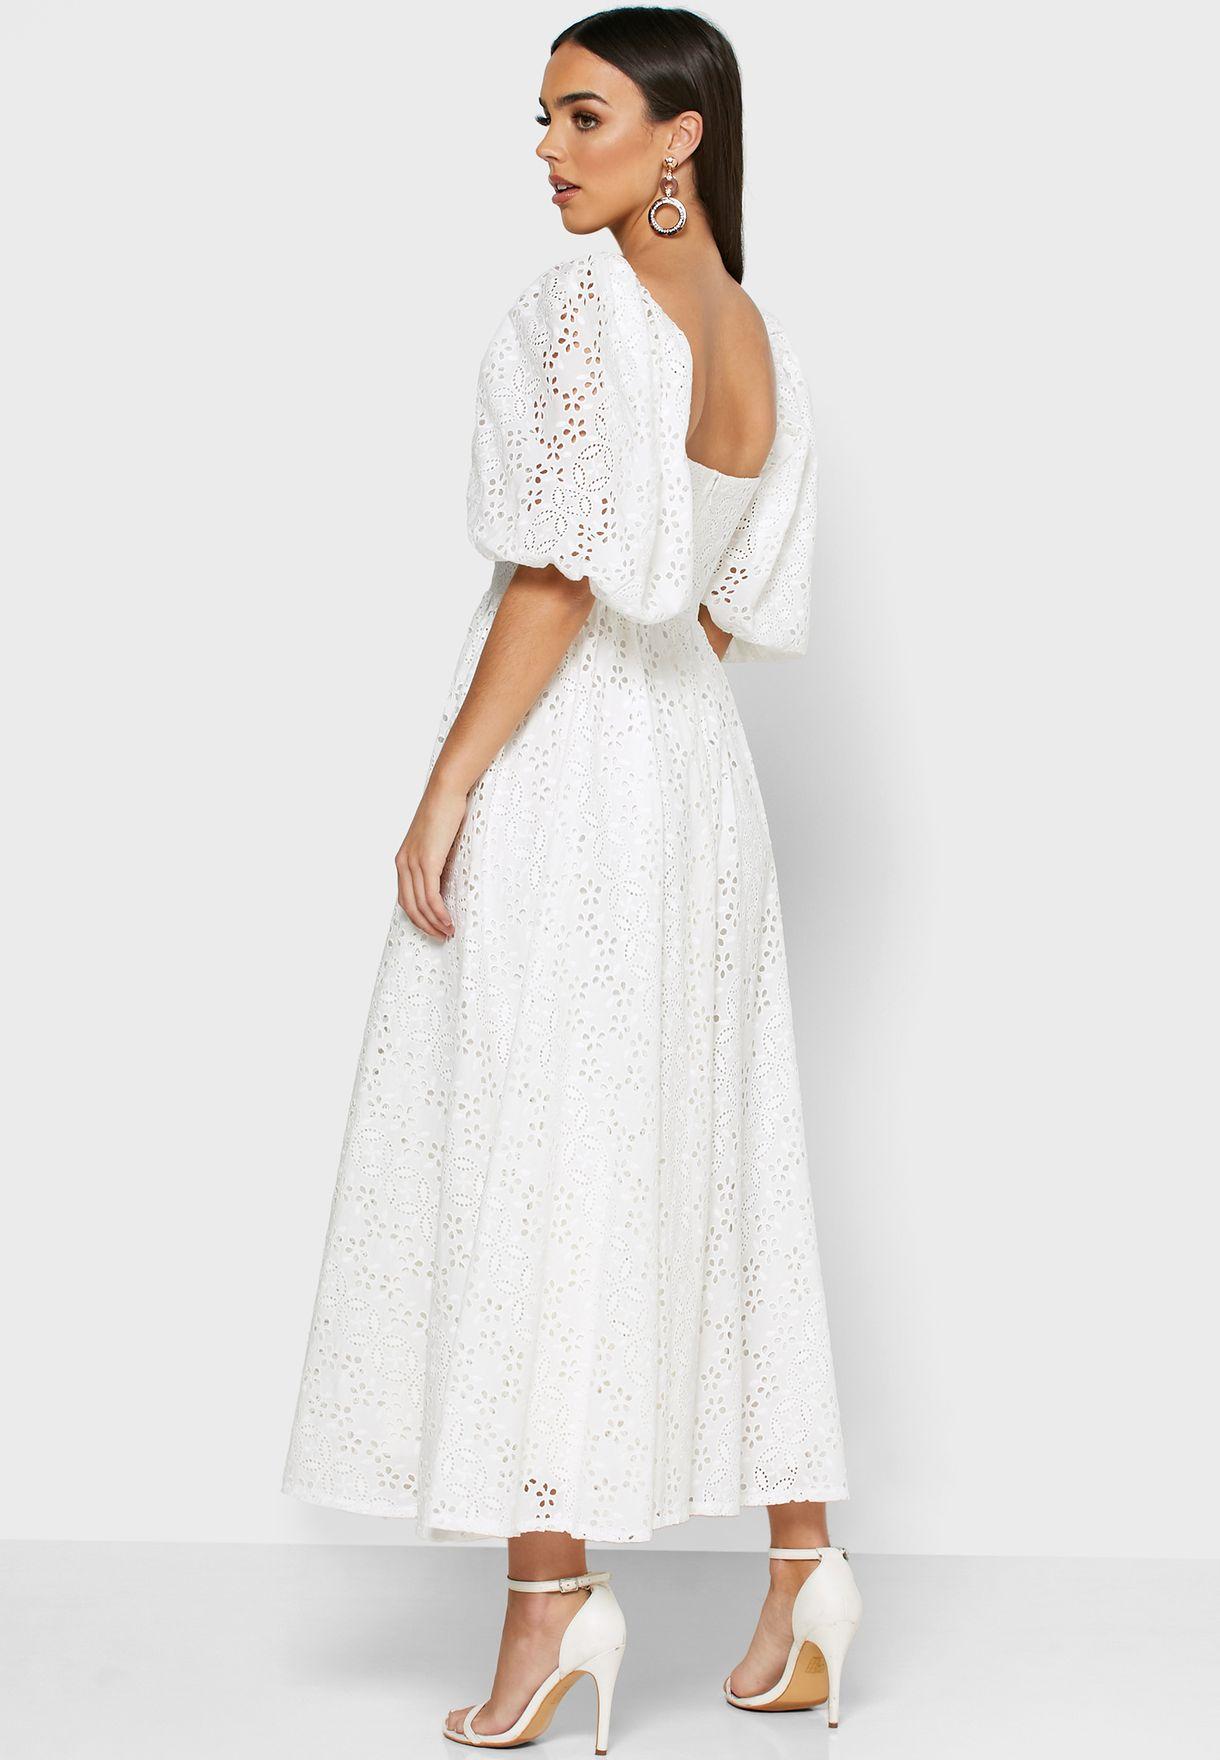 Puff Sleeve Button Through Schiffli Dress